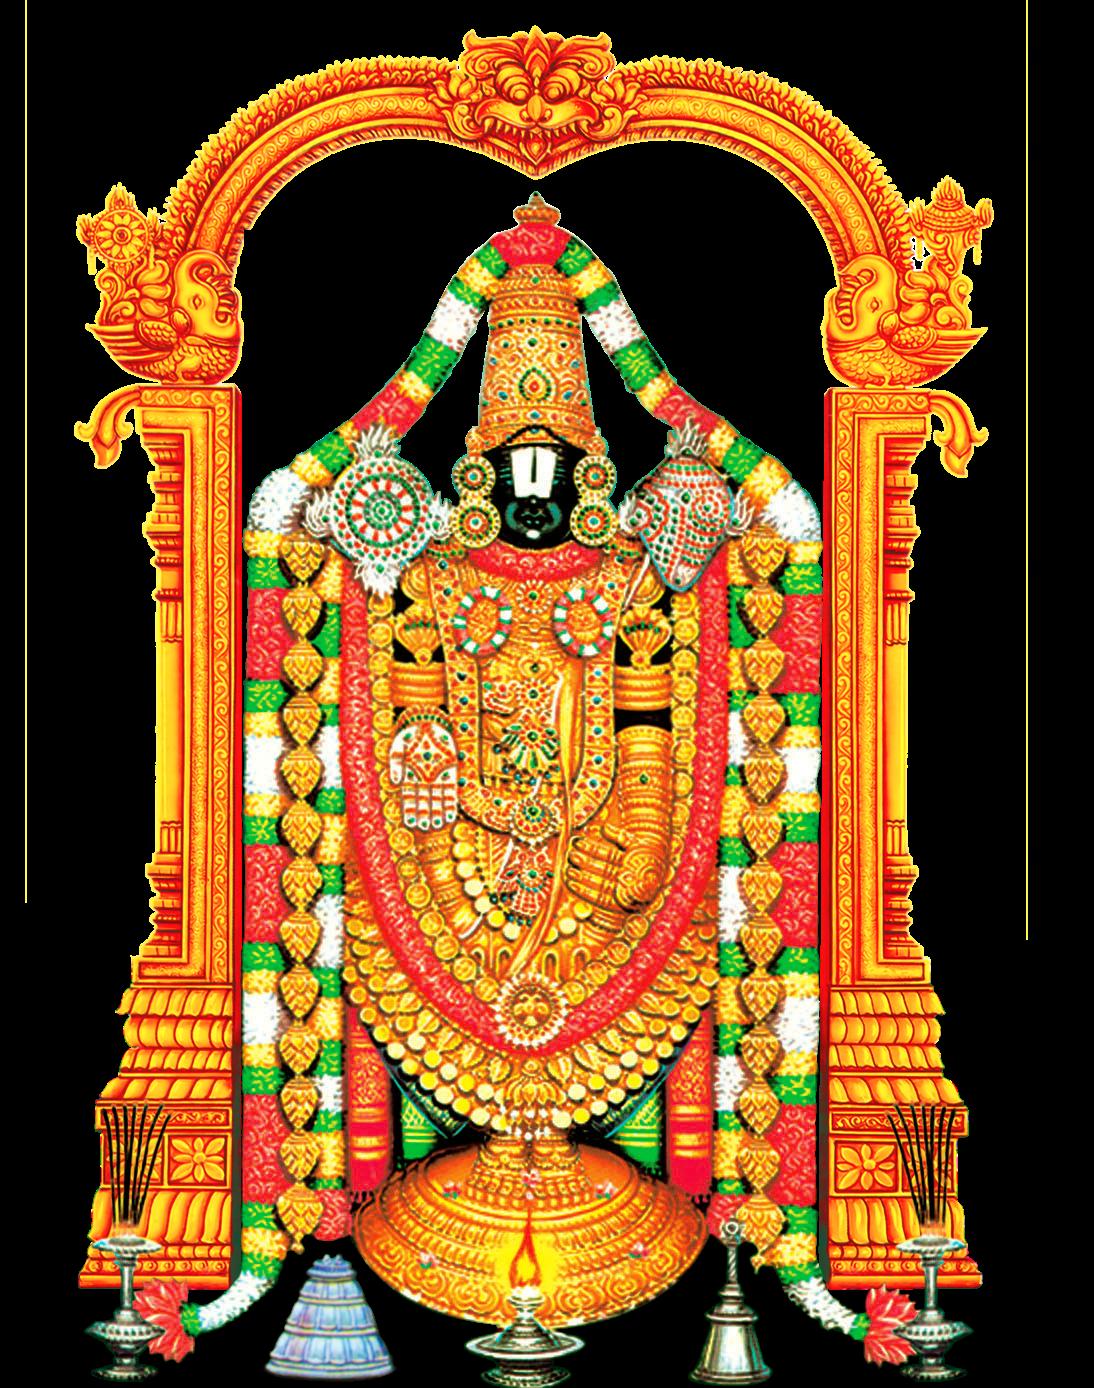 Balaji png free download. God clipart lord venkateswara